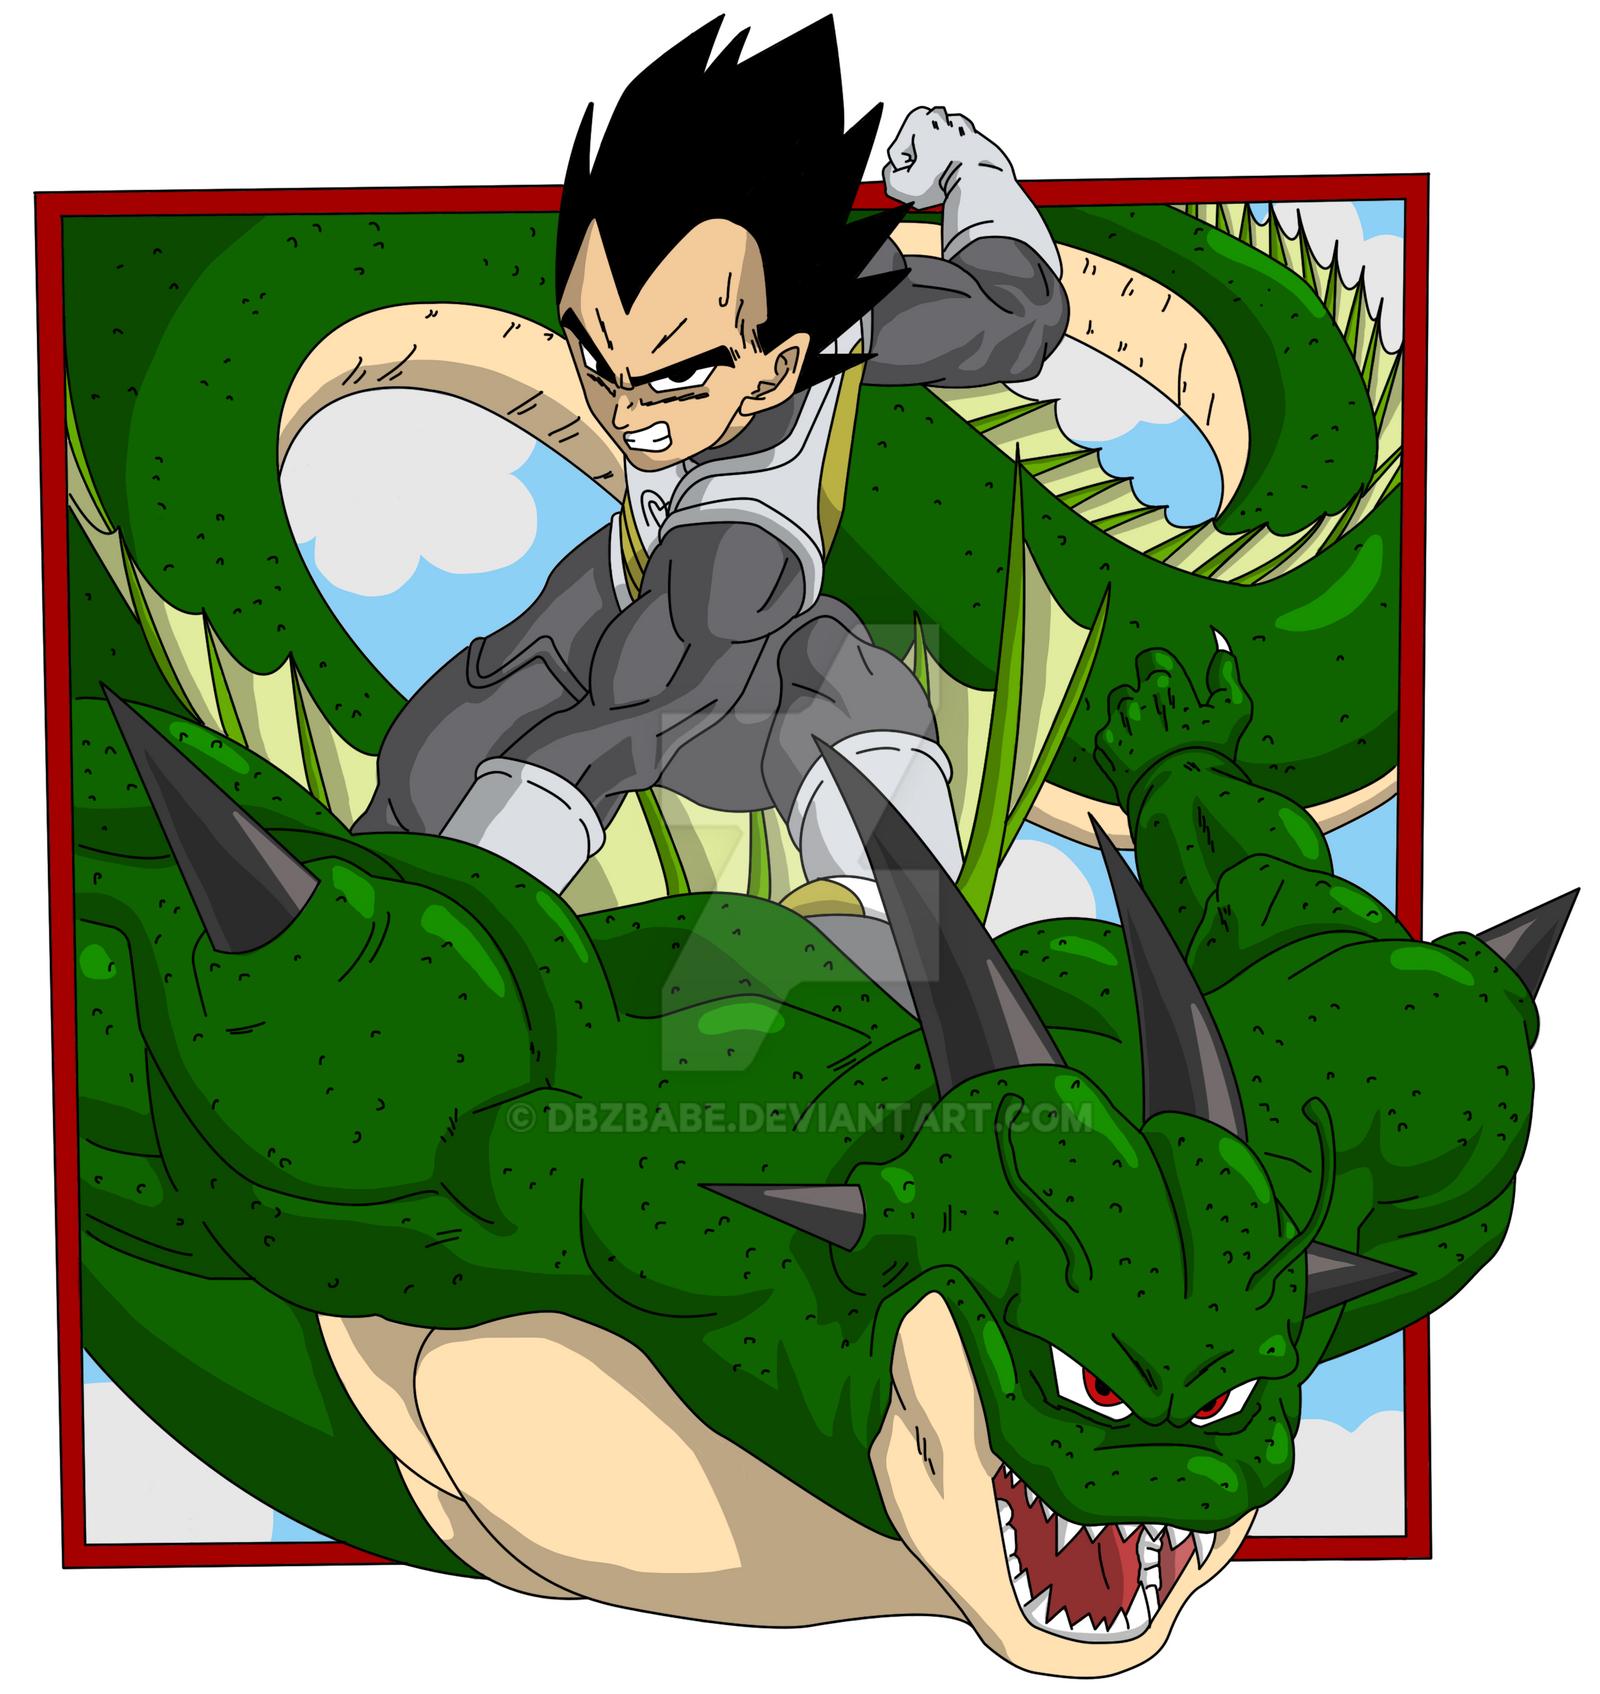 Dragon Ball Super Manga - Vegeta back cover by Dbzbabe